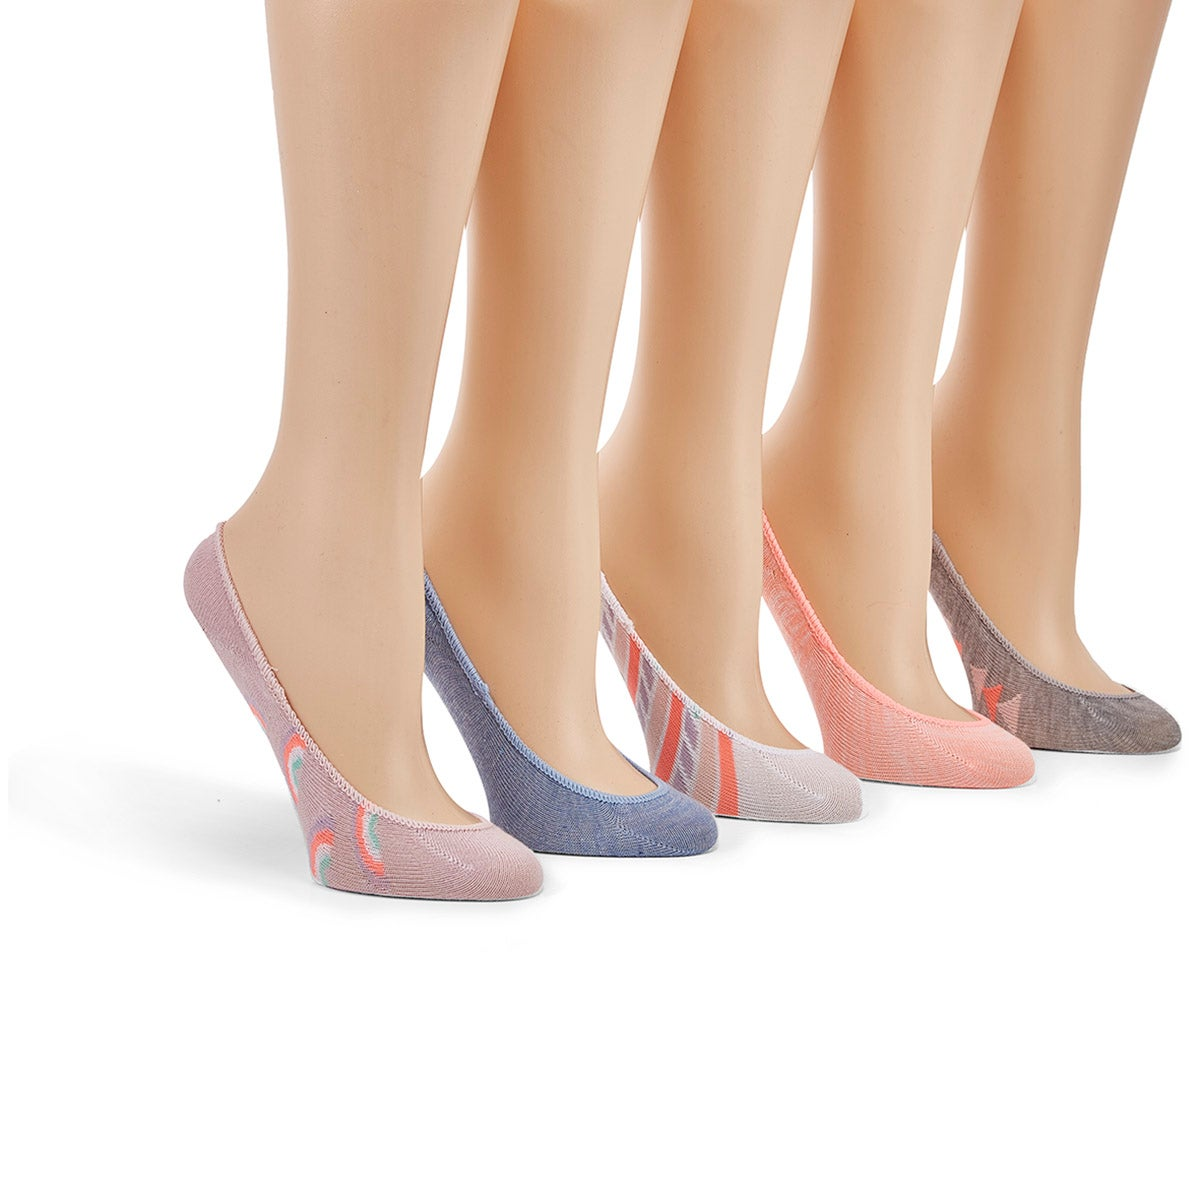 Socquettes invisibles SUPERLOW, multi, 5p, filles